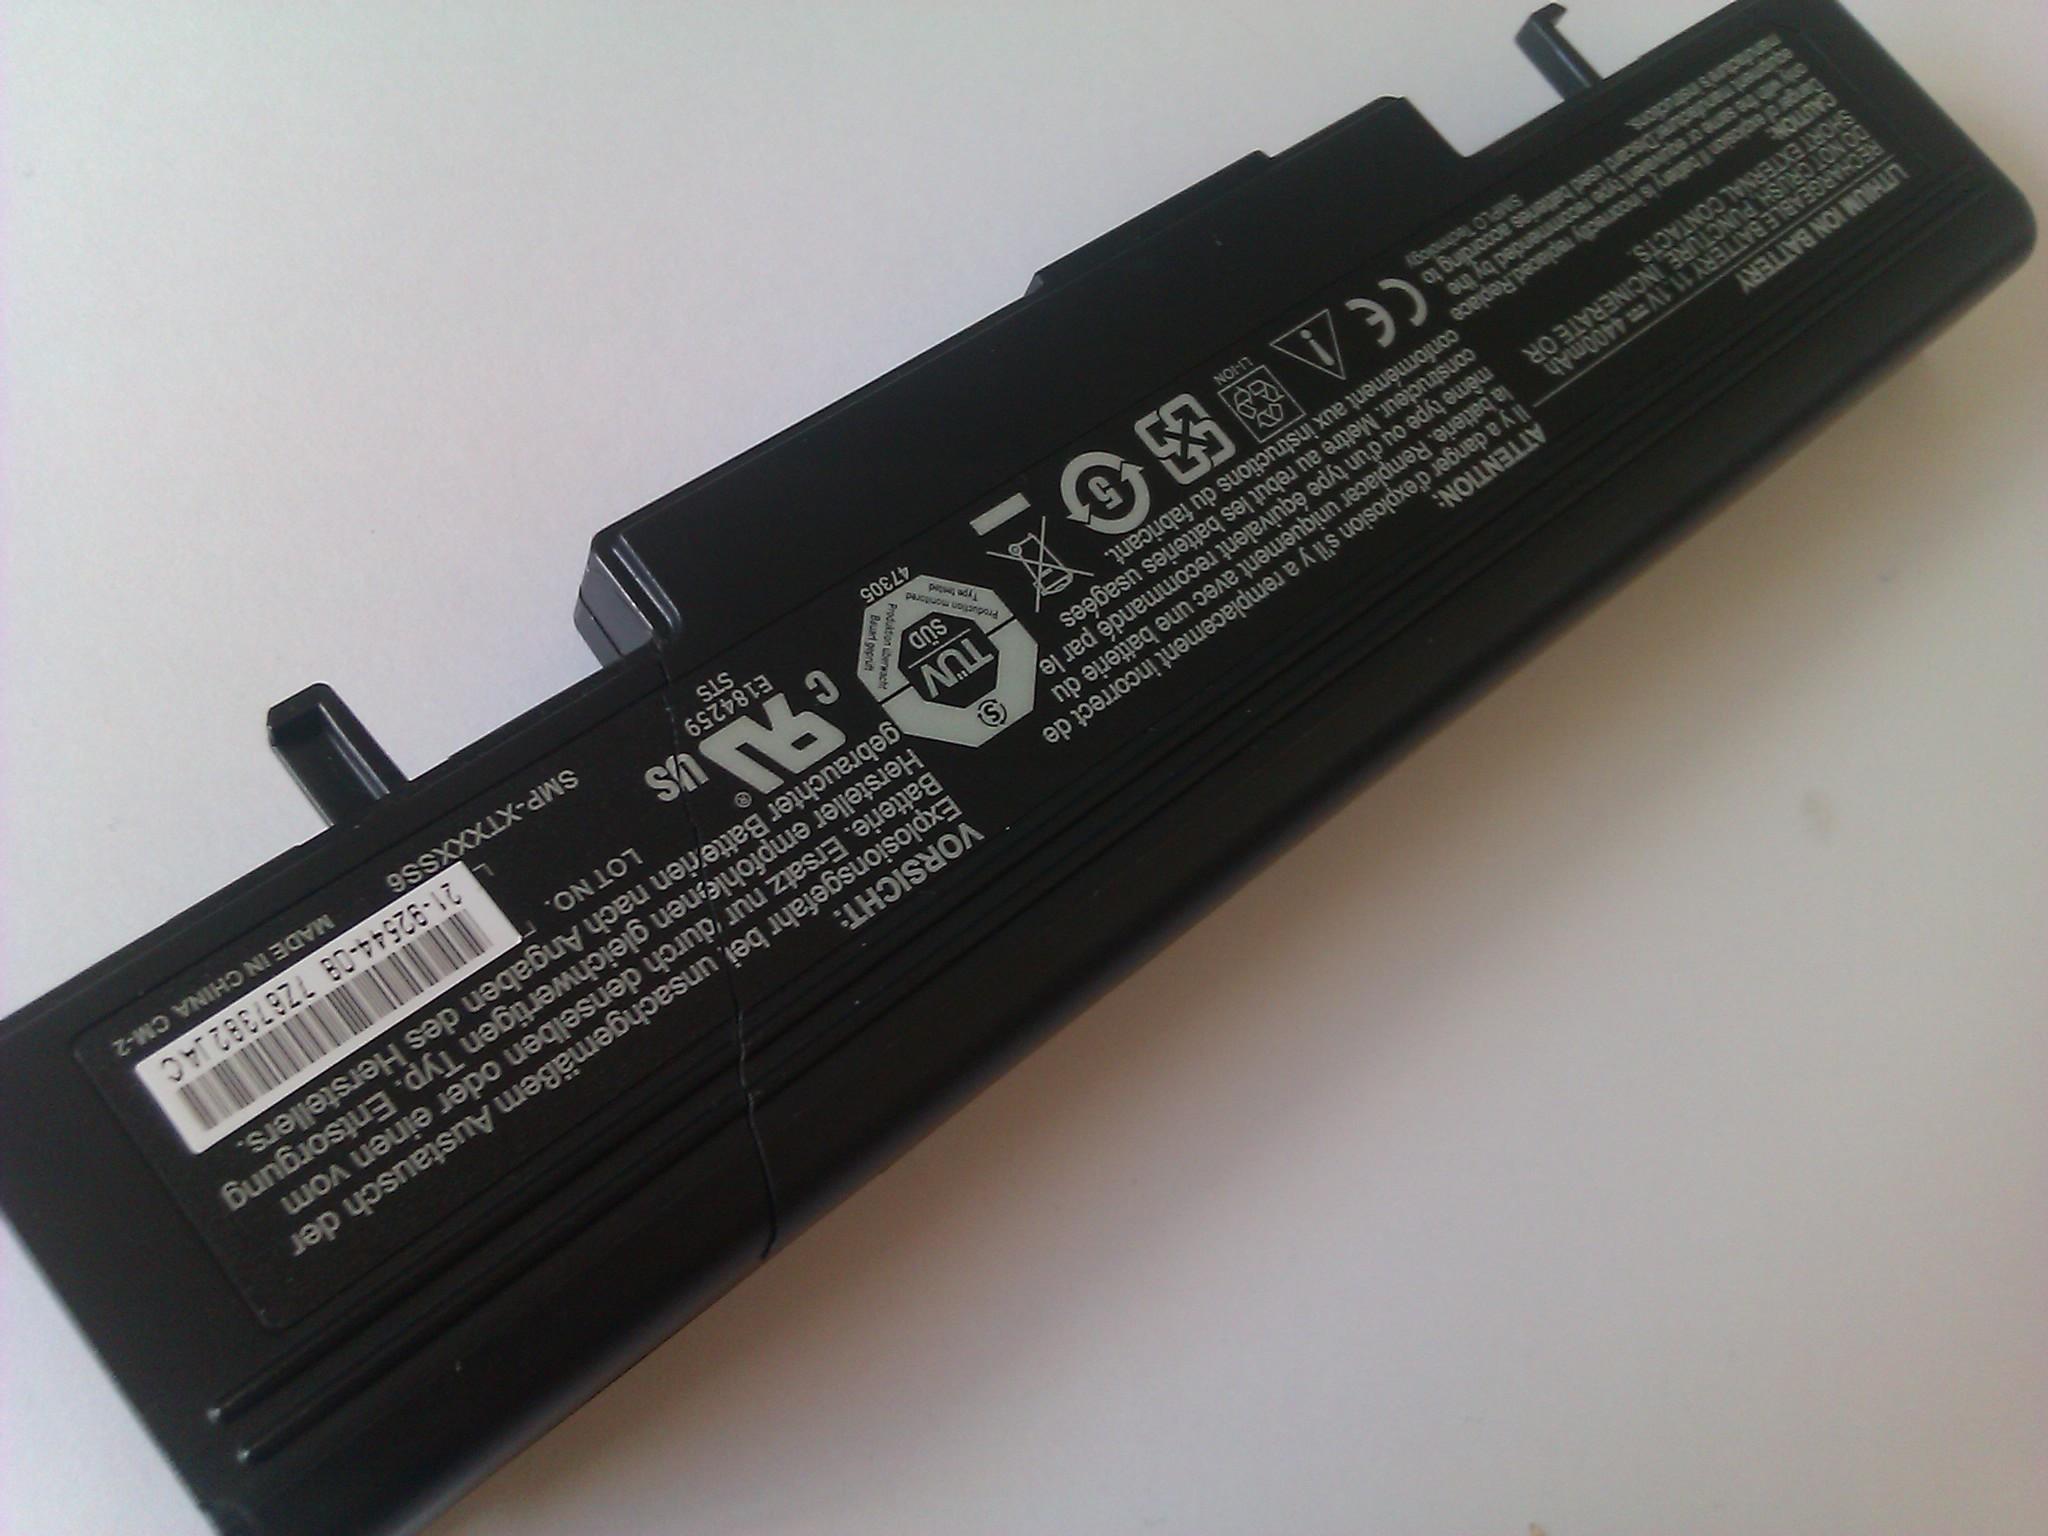 packard bell easynote sj51 battery smp xtxxxss6 11 1v. Black Bedroom Furniture Sets. Home Design Ideas